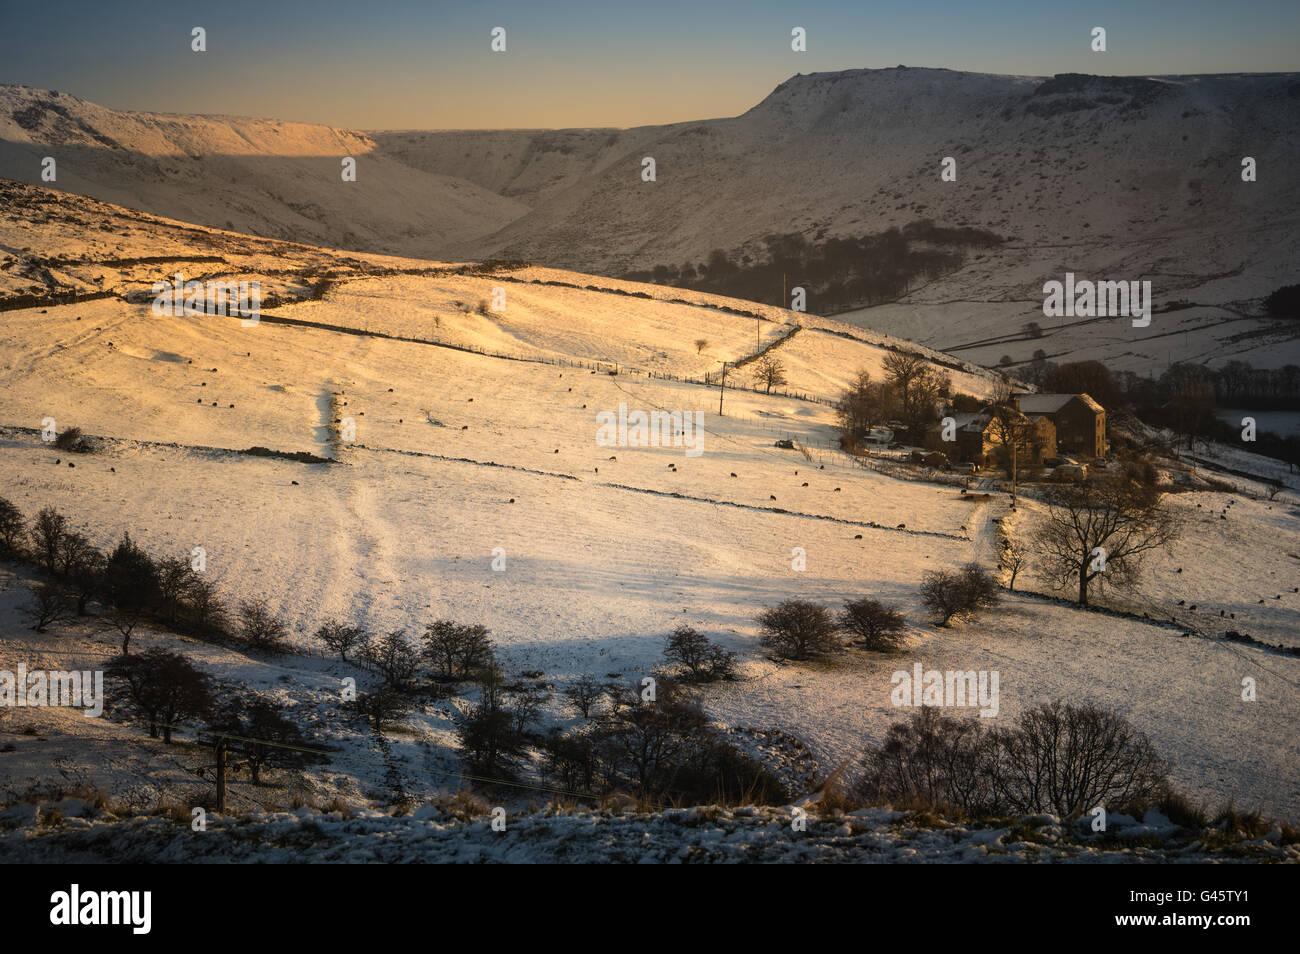 Farm and winter snow, Greenfield, Saddleworth, UK, near sunset - Stock Image